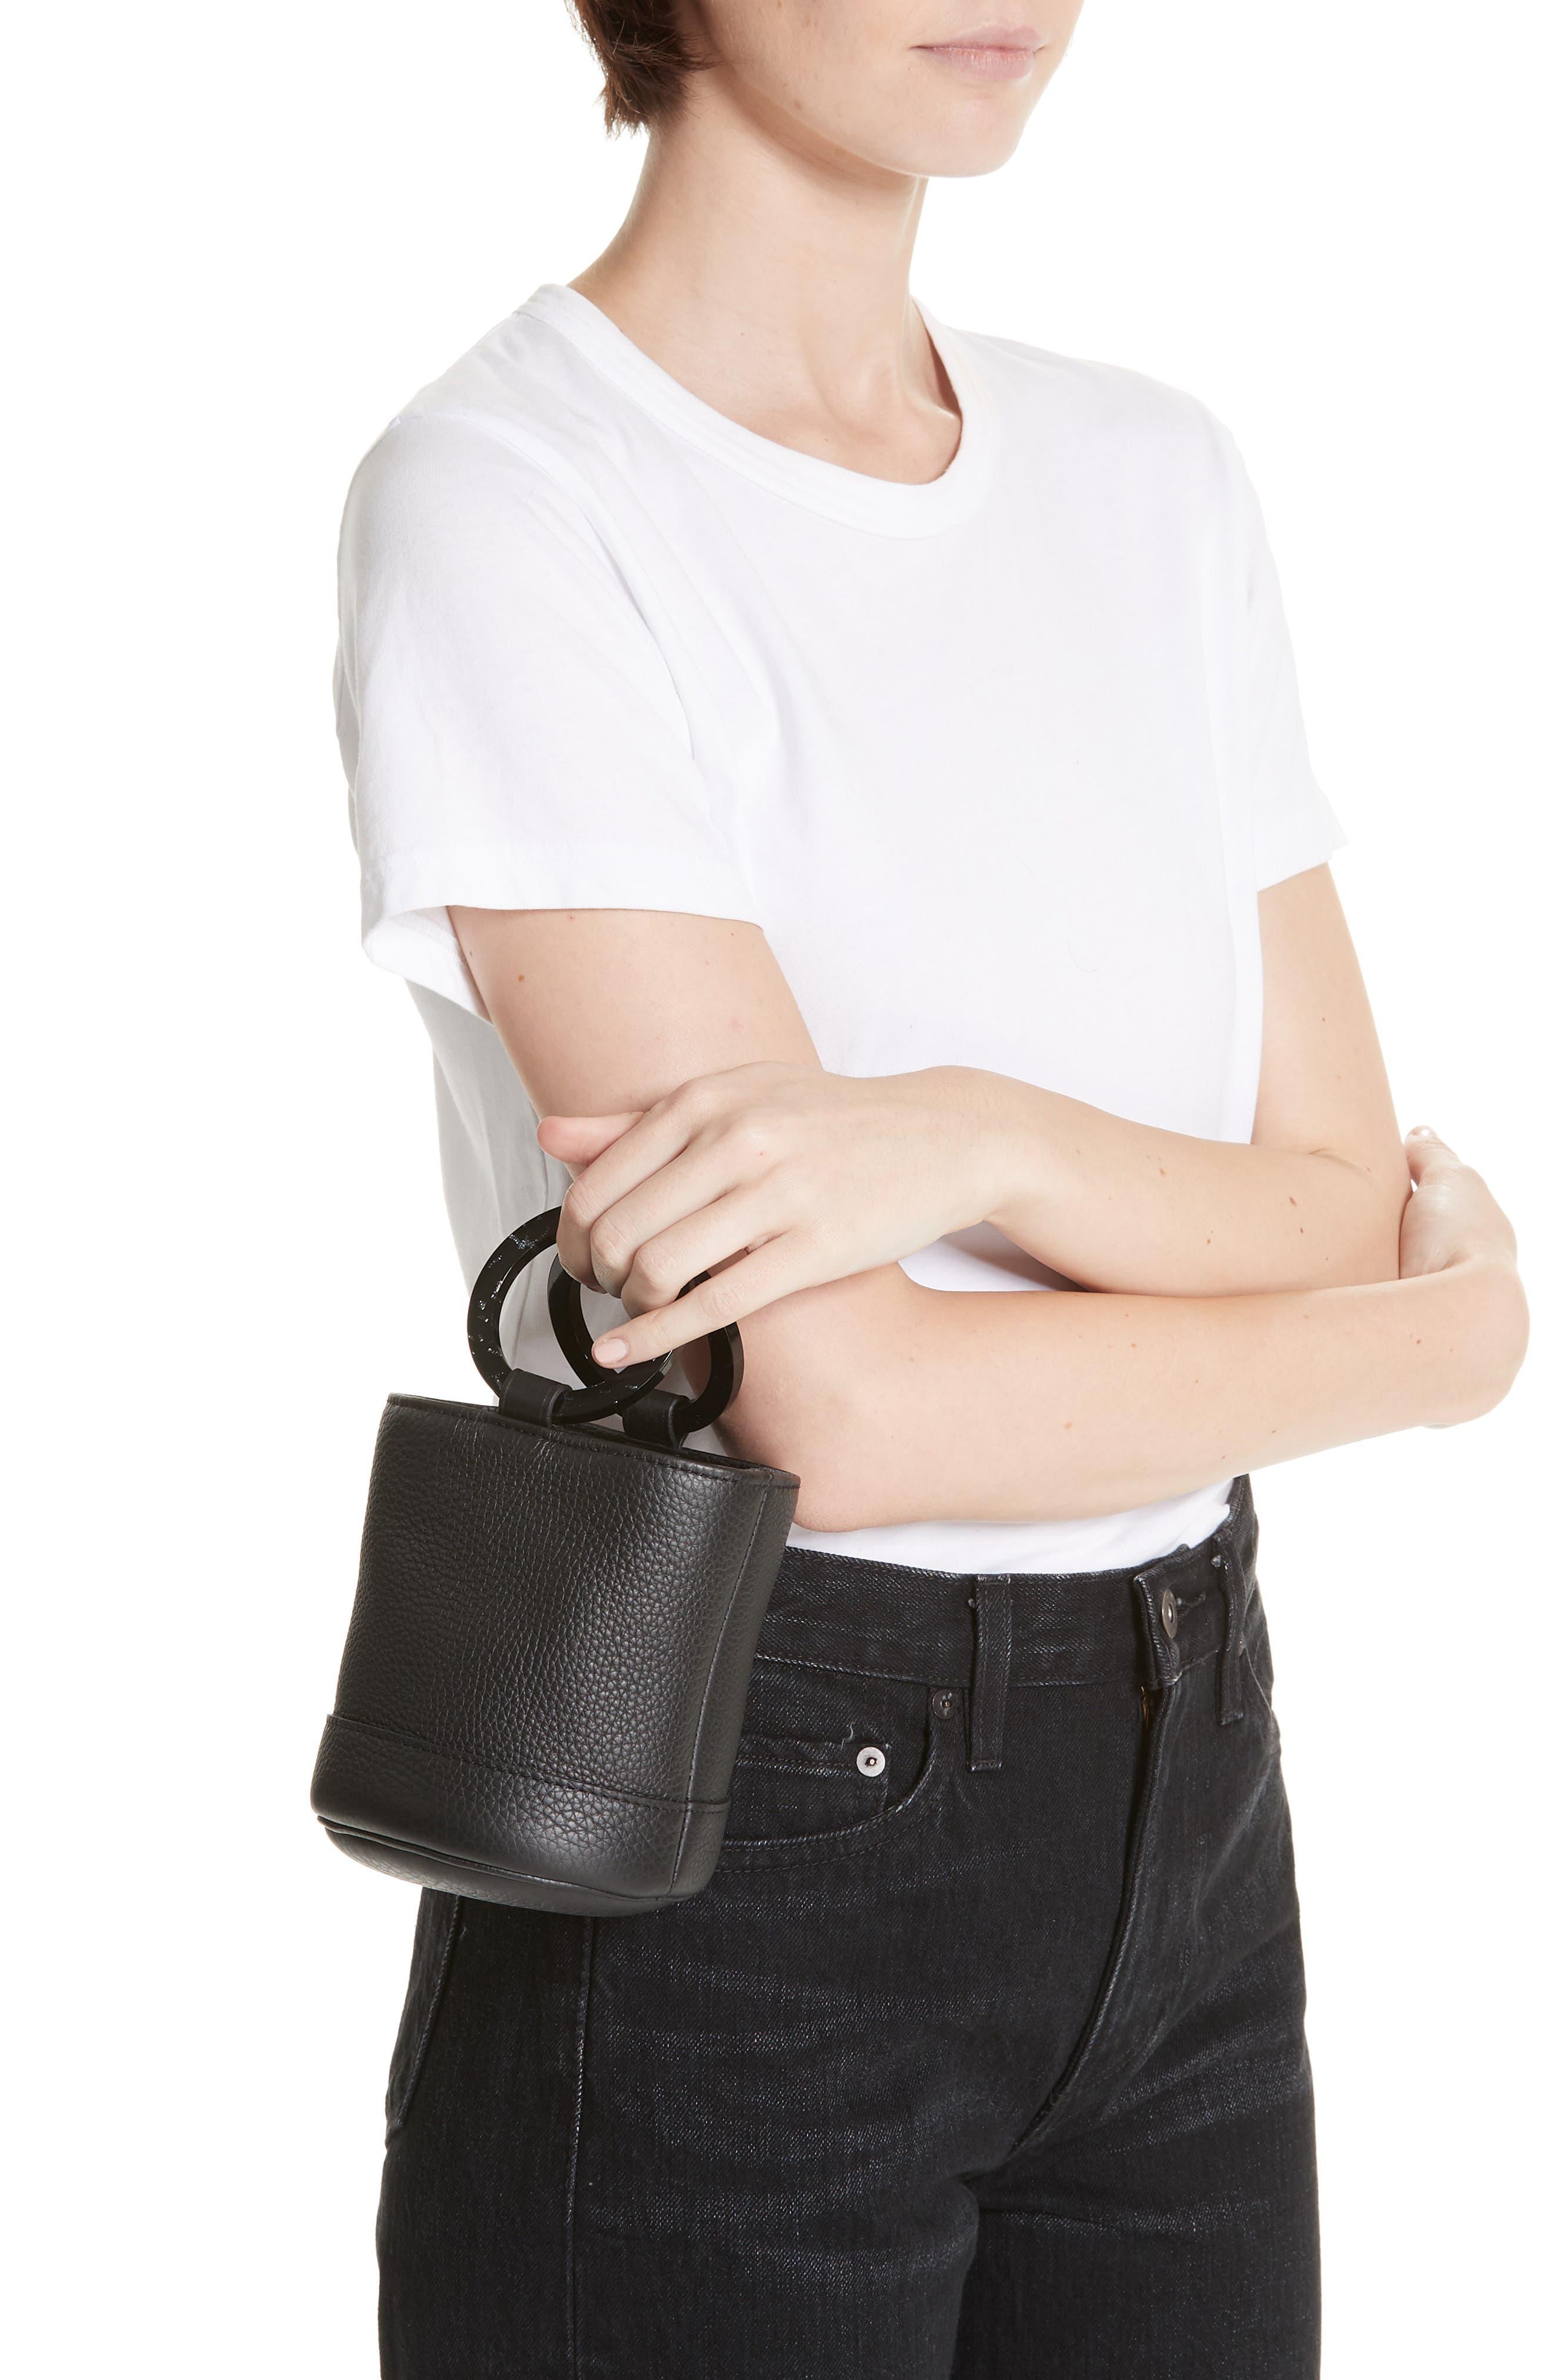 Bonsai 15 Calfskin Leather Bucket Bag,                             Alternate thumbnail 2, color,                             ALL BLACK